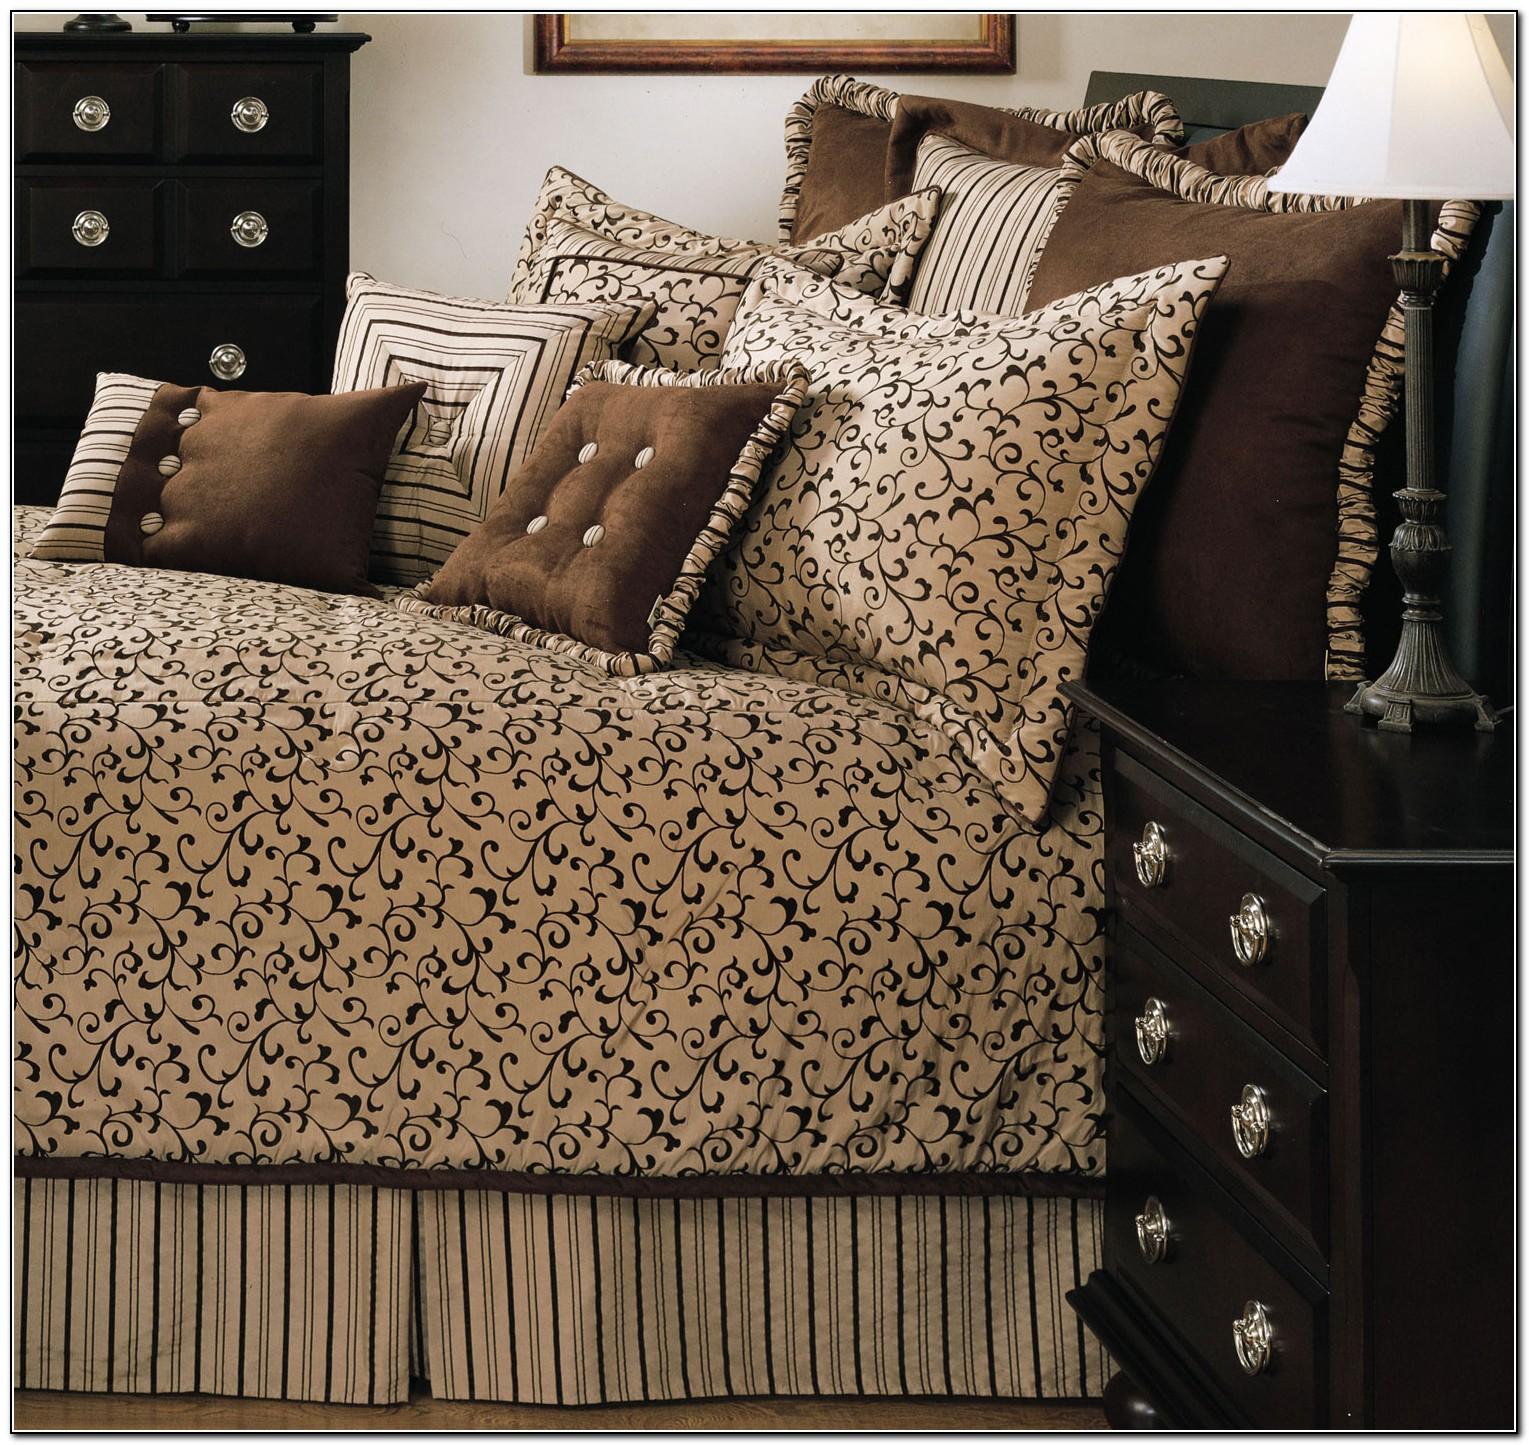 Sherry Kline French Country Bedding Beds Home Design Ideas Z5nkaegq868192